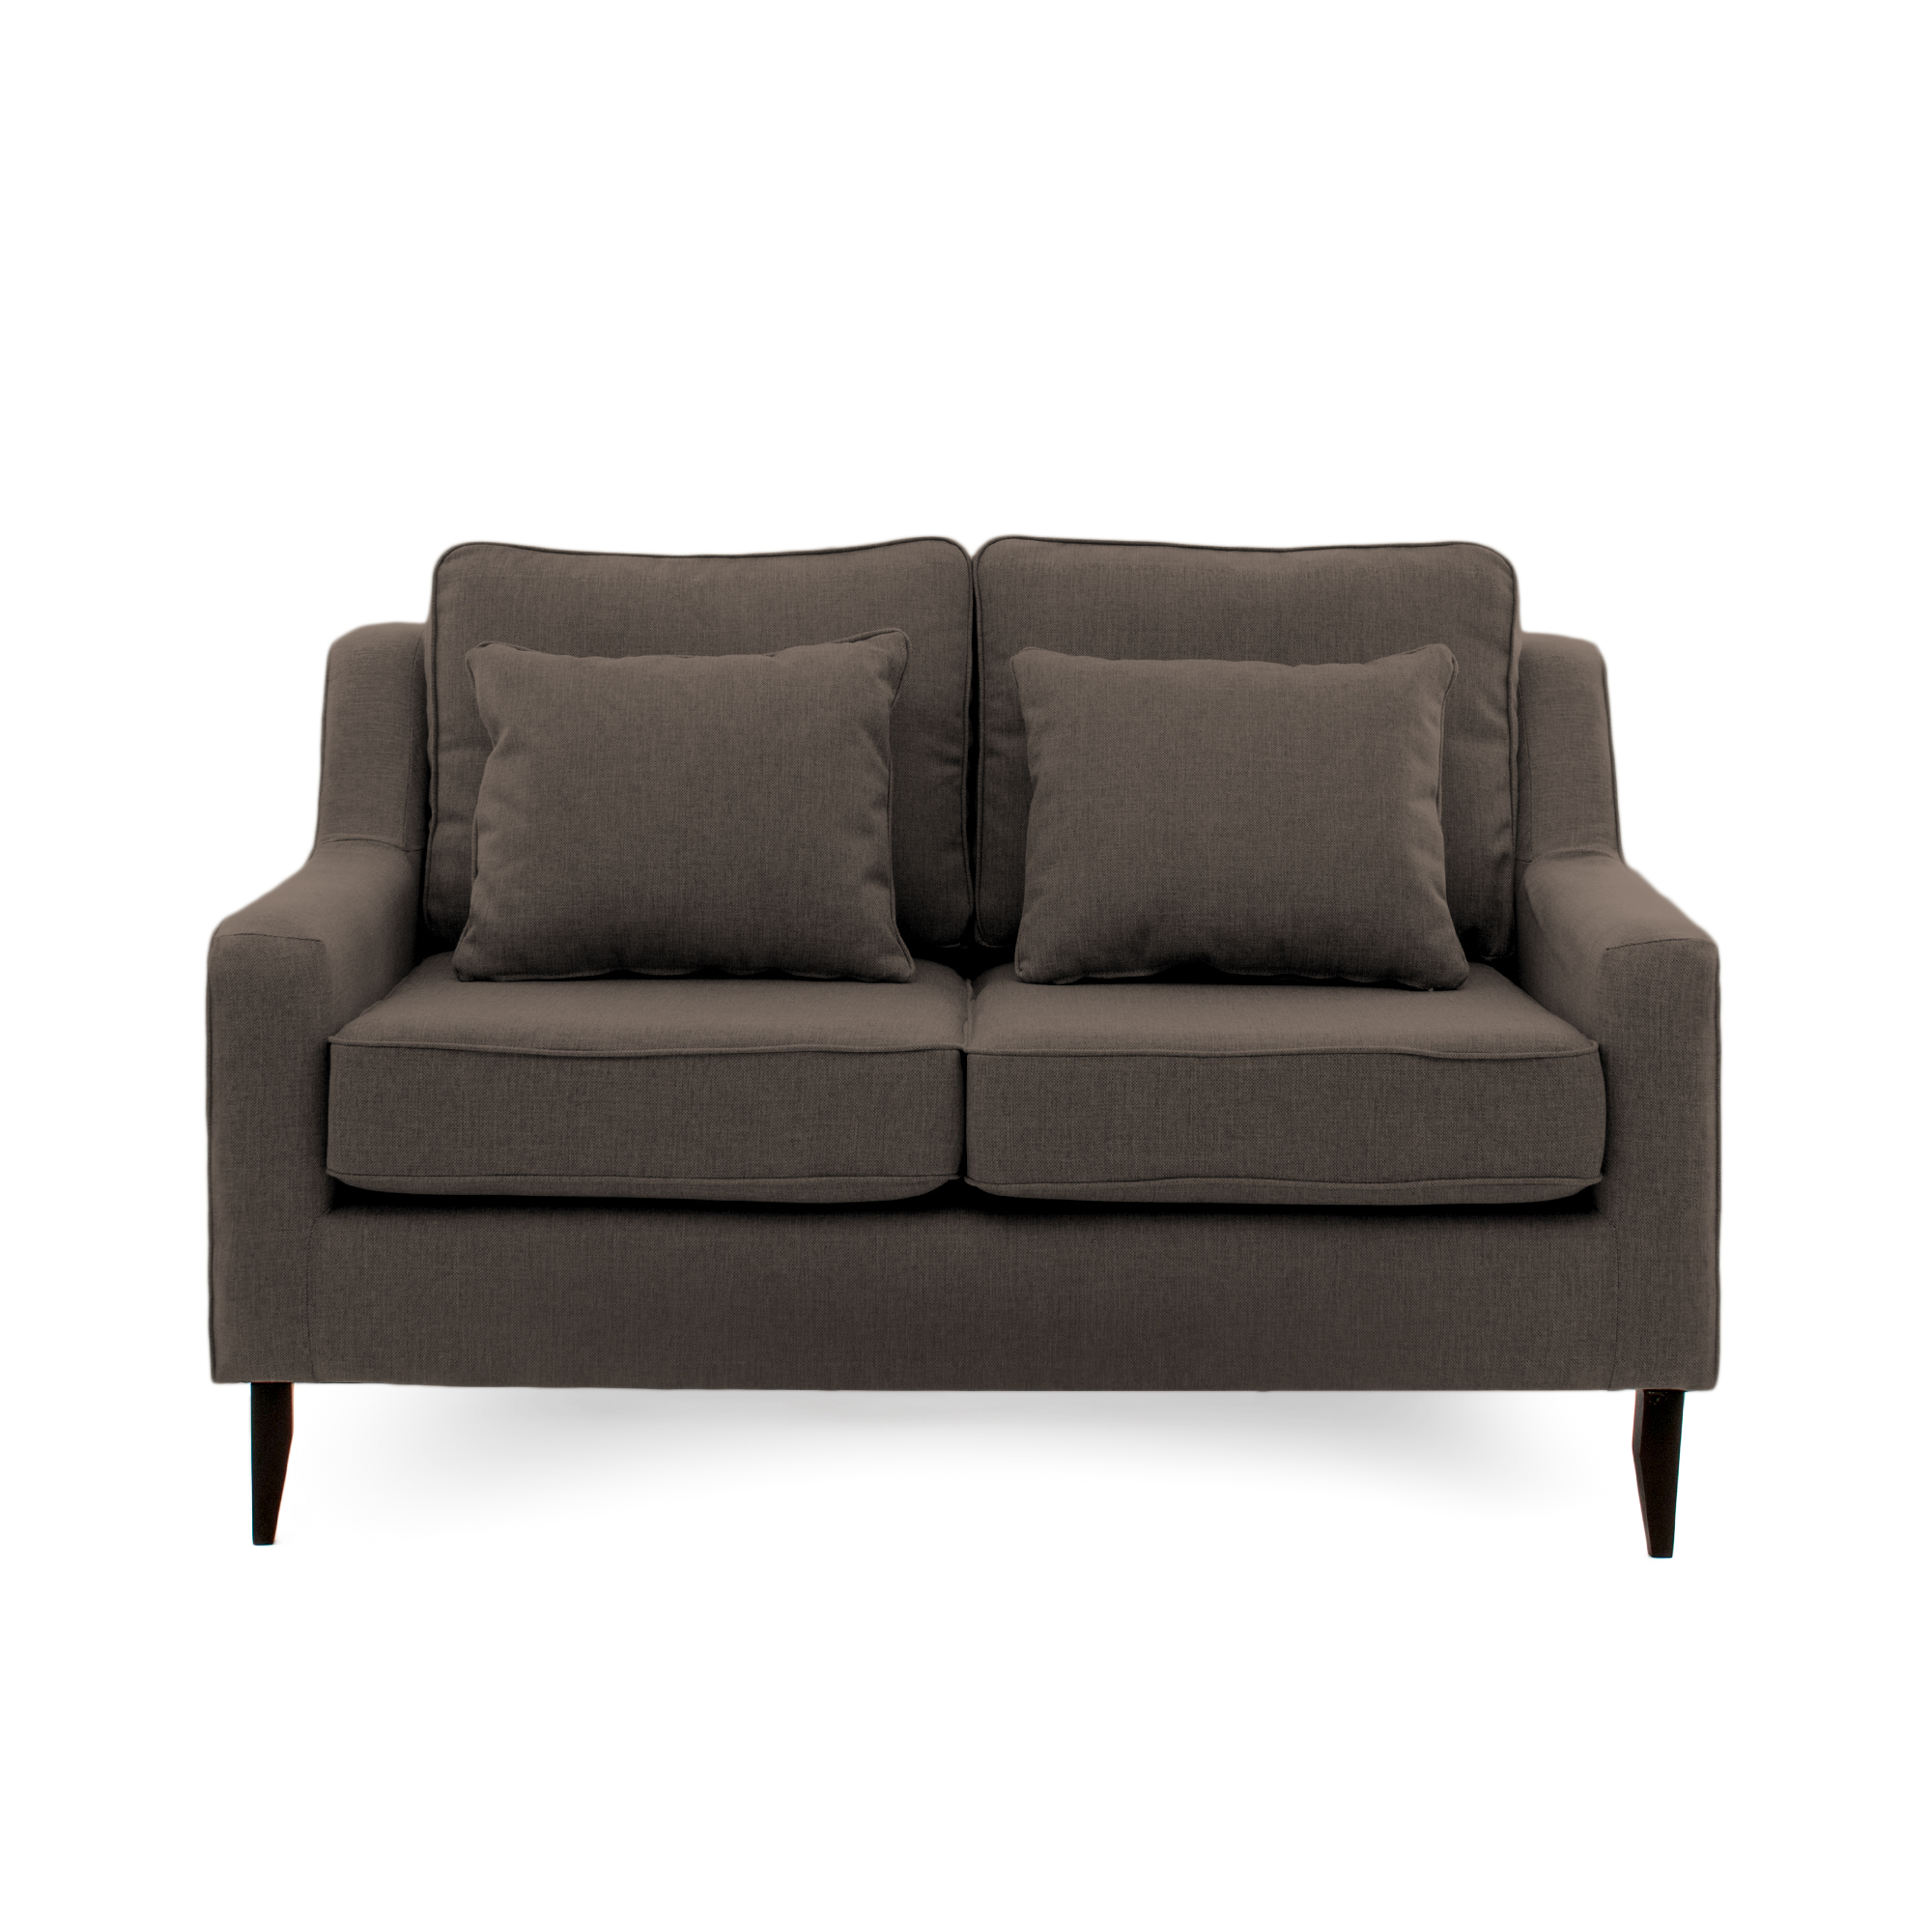 Canapea Fixa 2 locuri Bond Brown